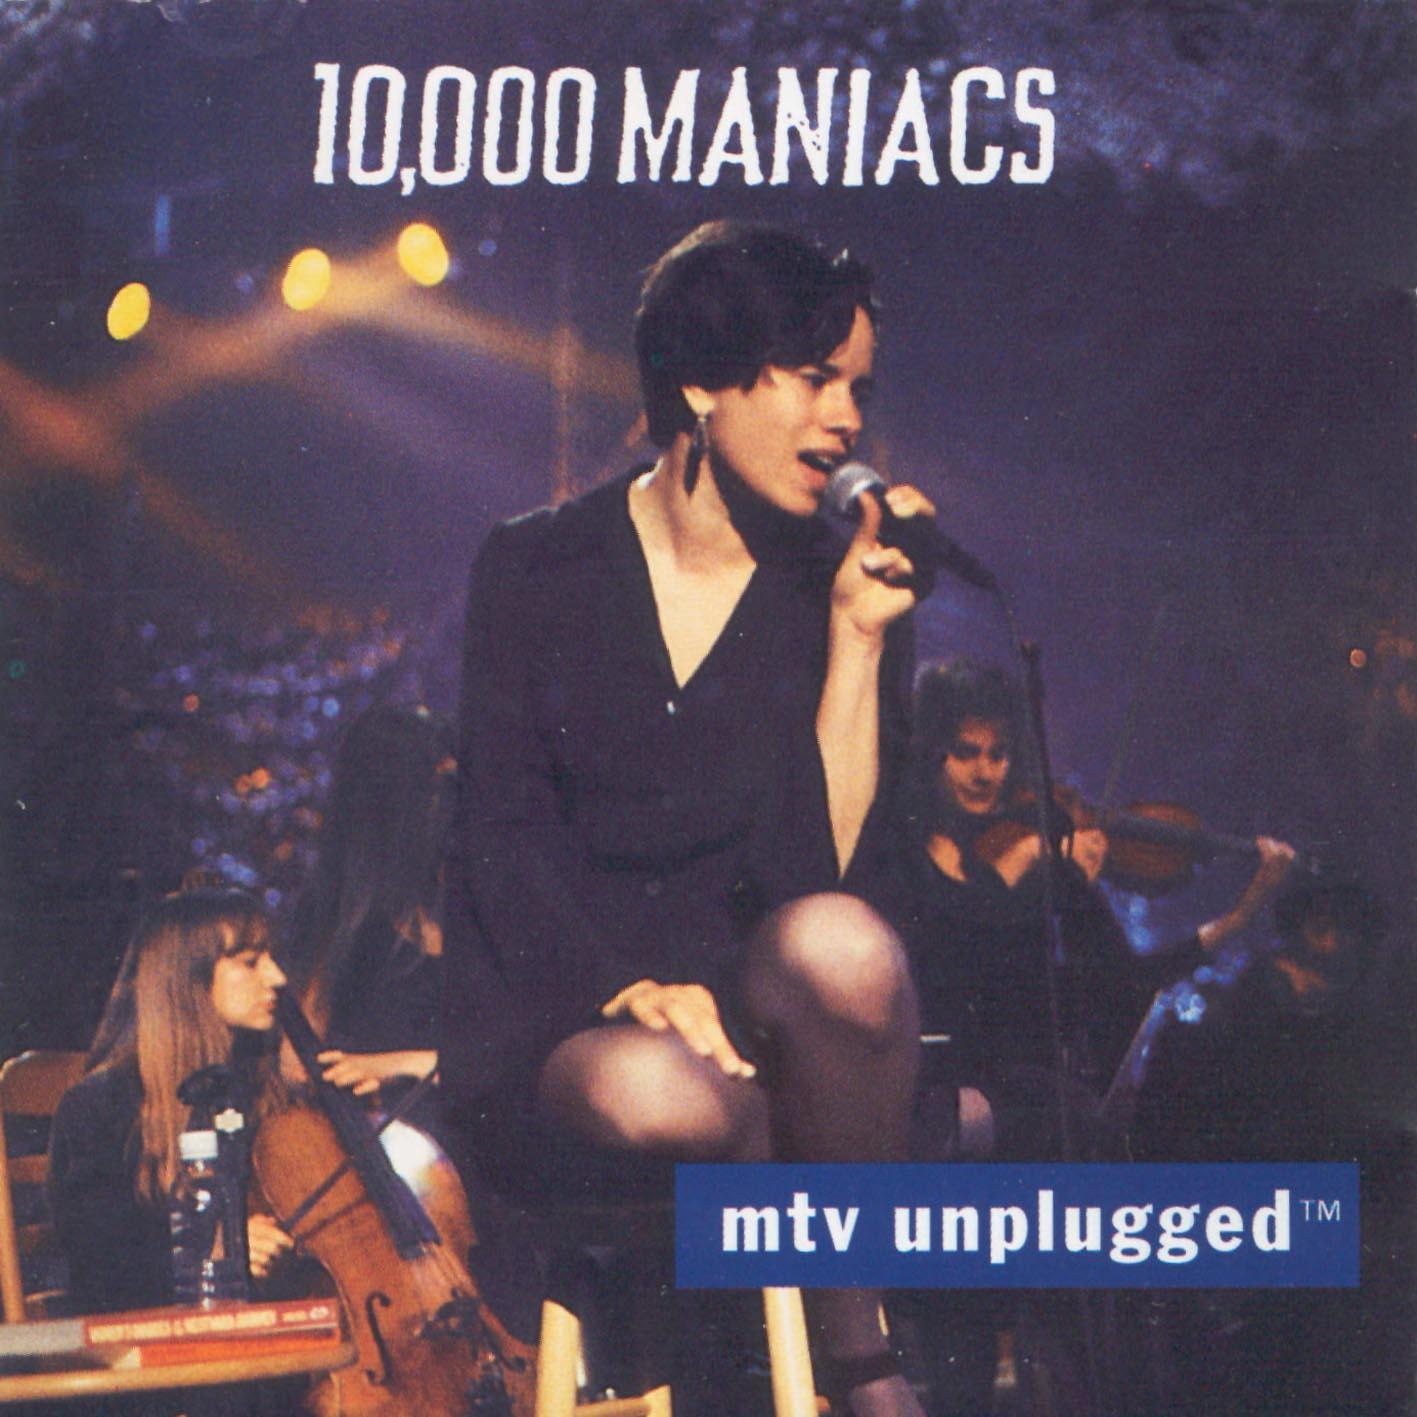 MTV Unplugged | similarsong